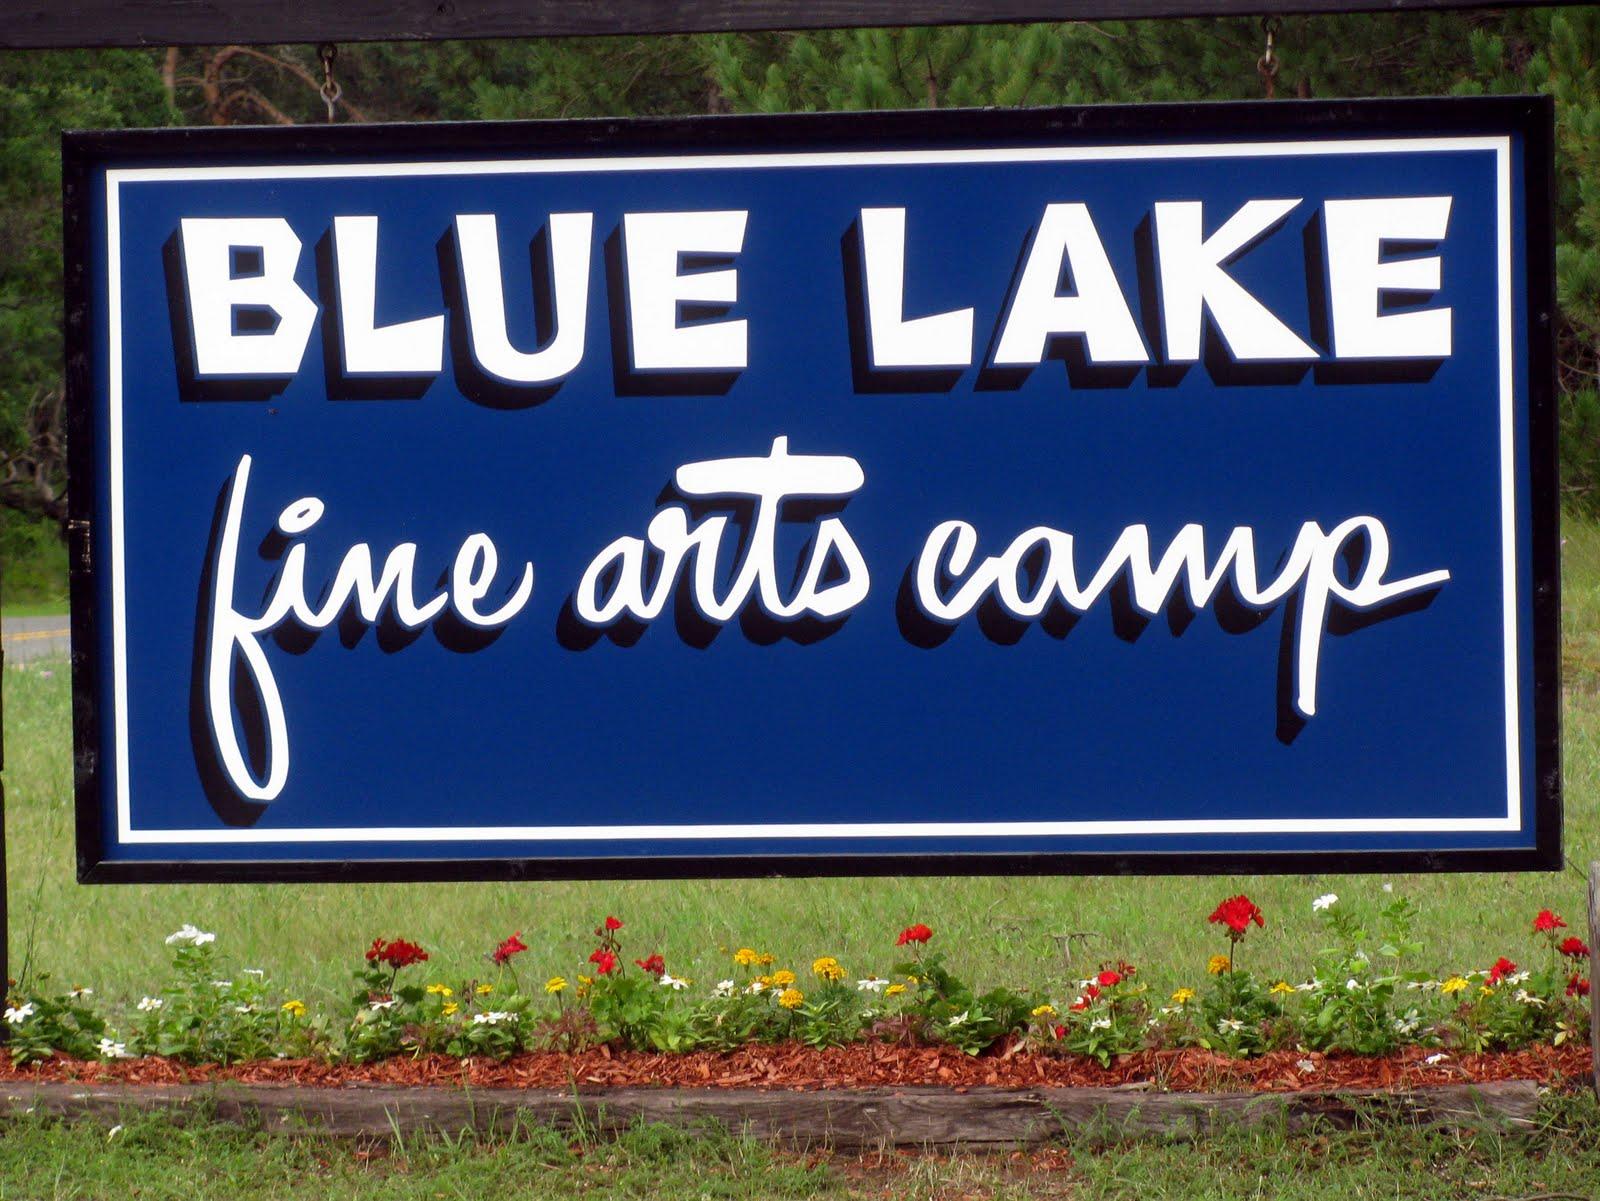 cu art opportunities announcements sumer jobs for visual arts sumer jobs for visual arts majors blue lake fine arts camp